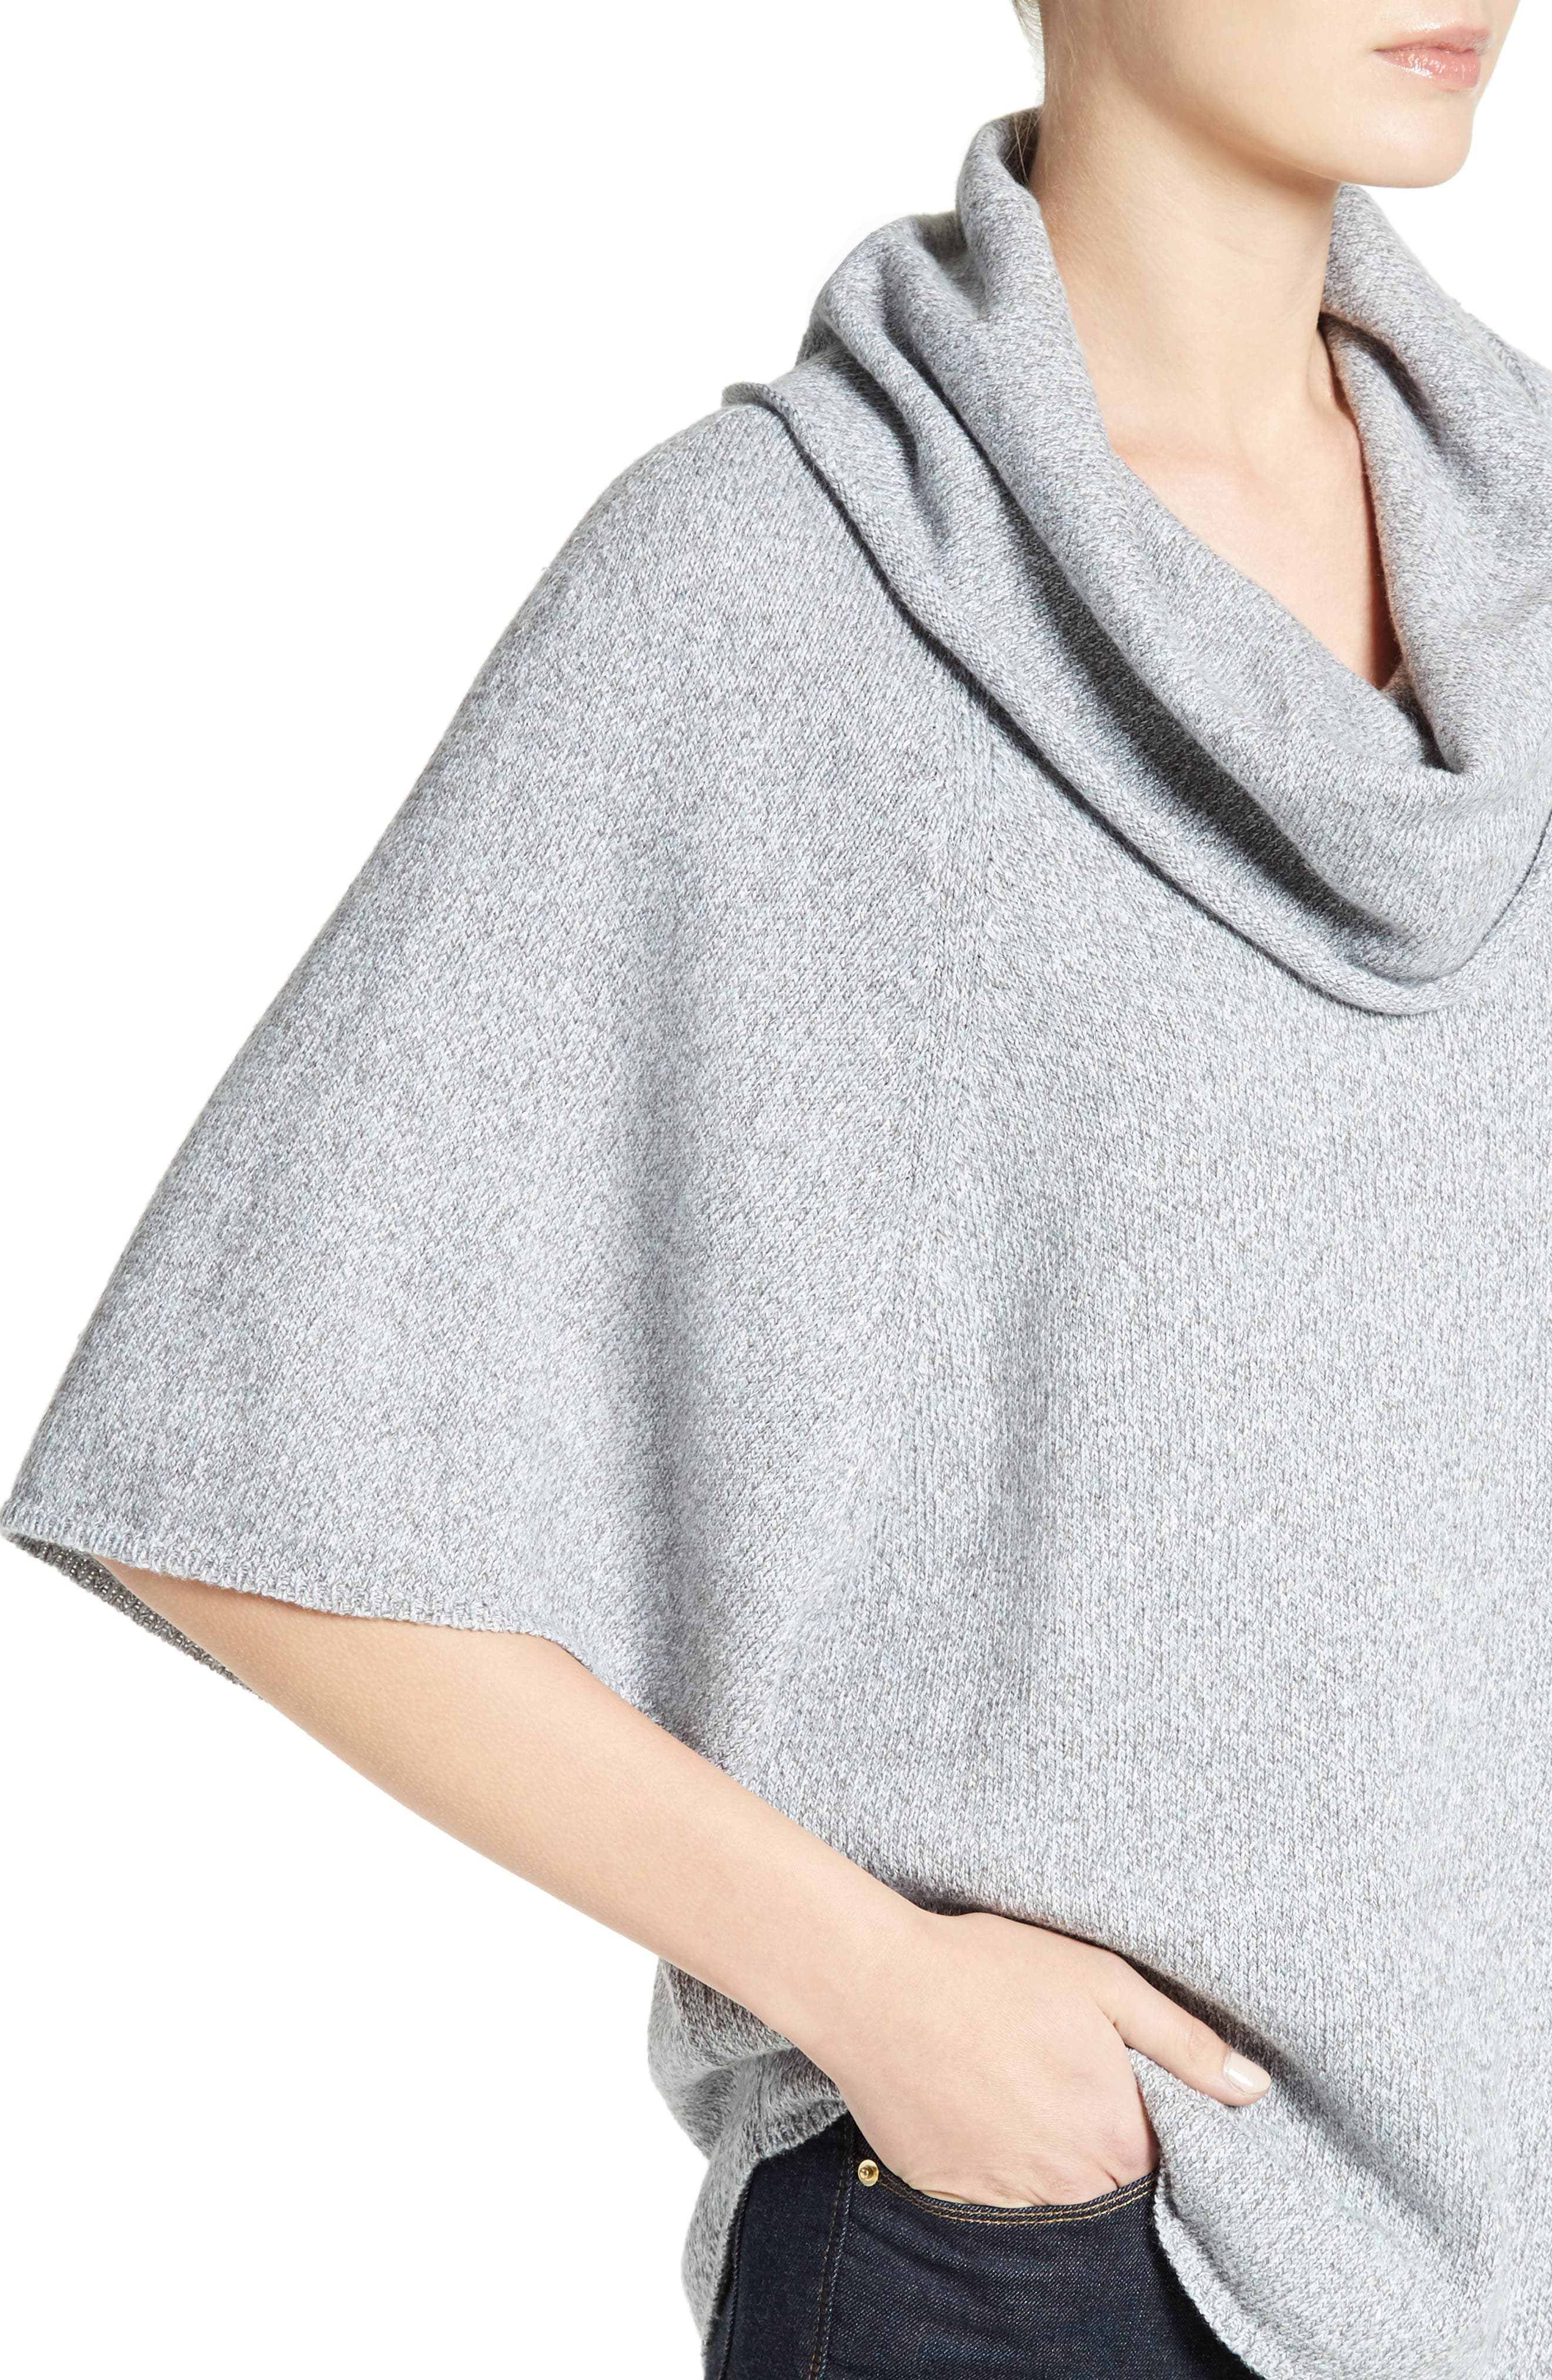 Celia Cowl Neck Sweater,                             Alternate thumbnail 4, color,                             059